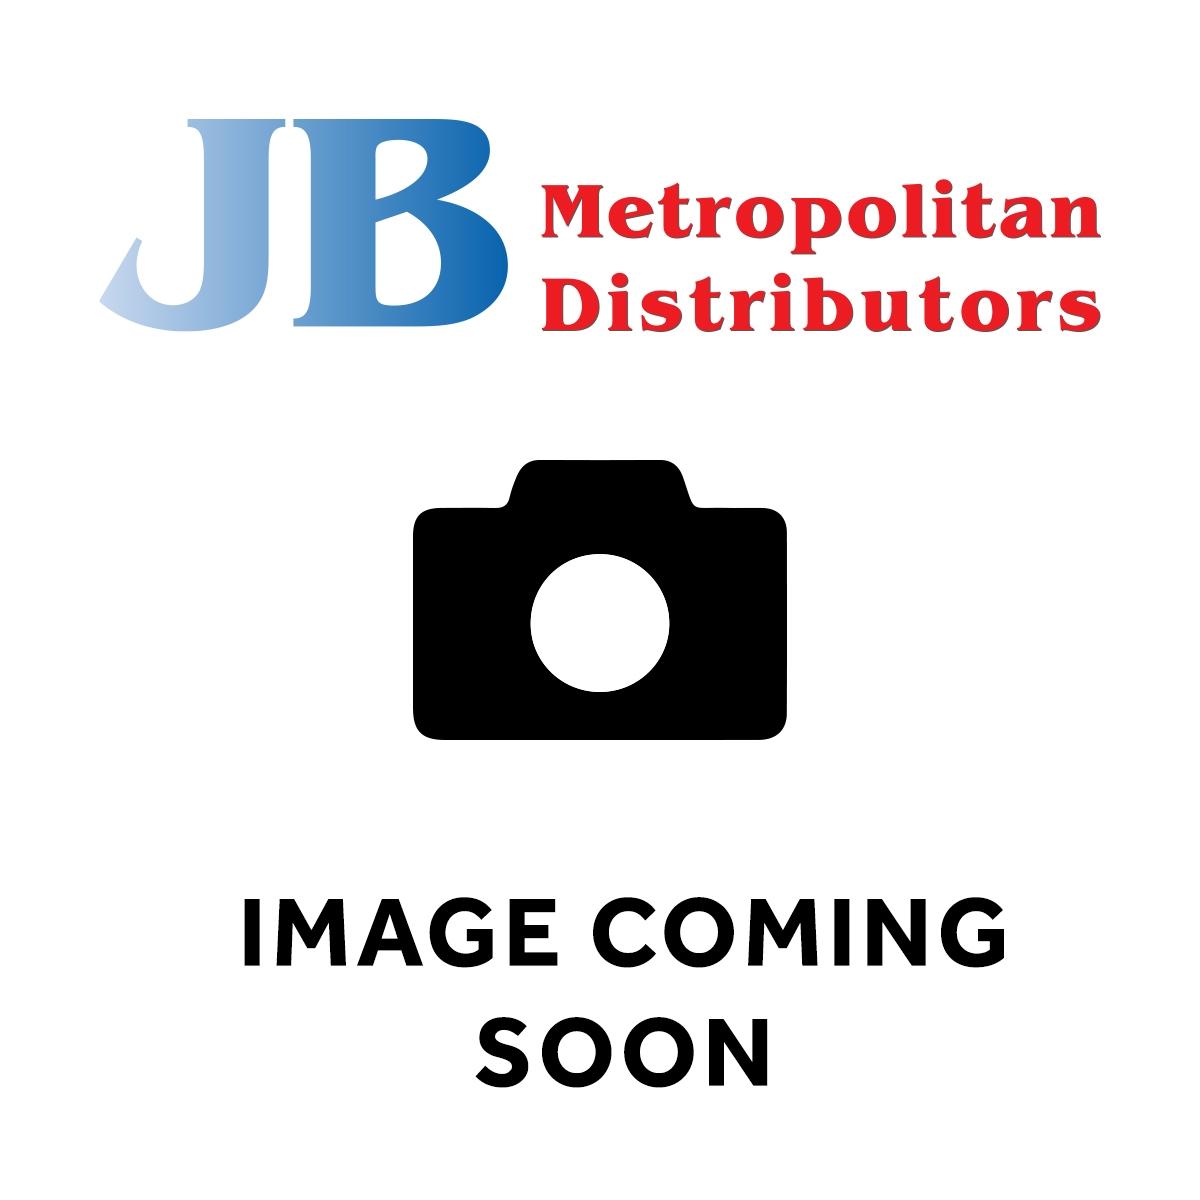 200G ARNOTTS CHOCOLATE MONTE